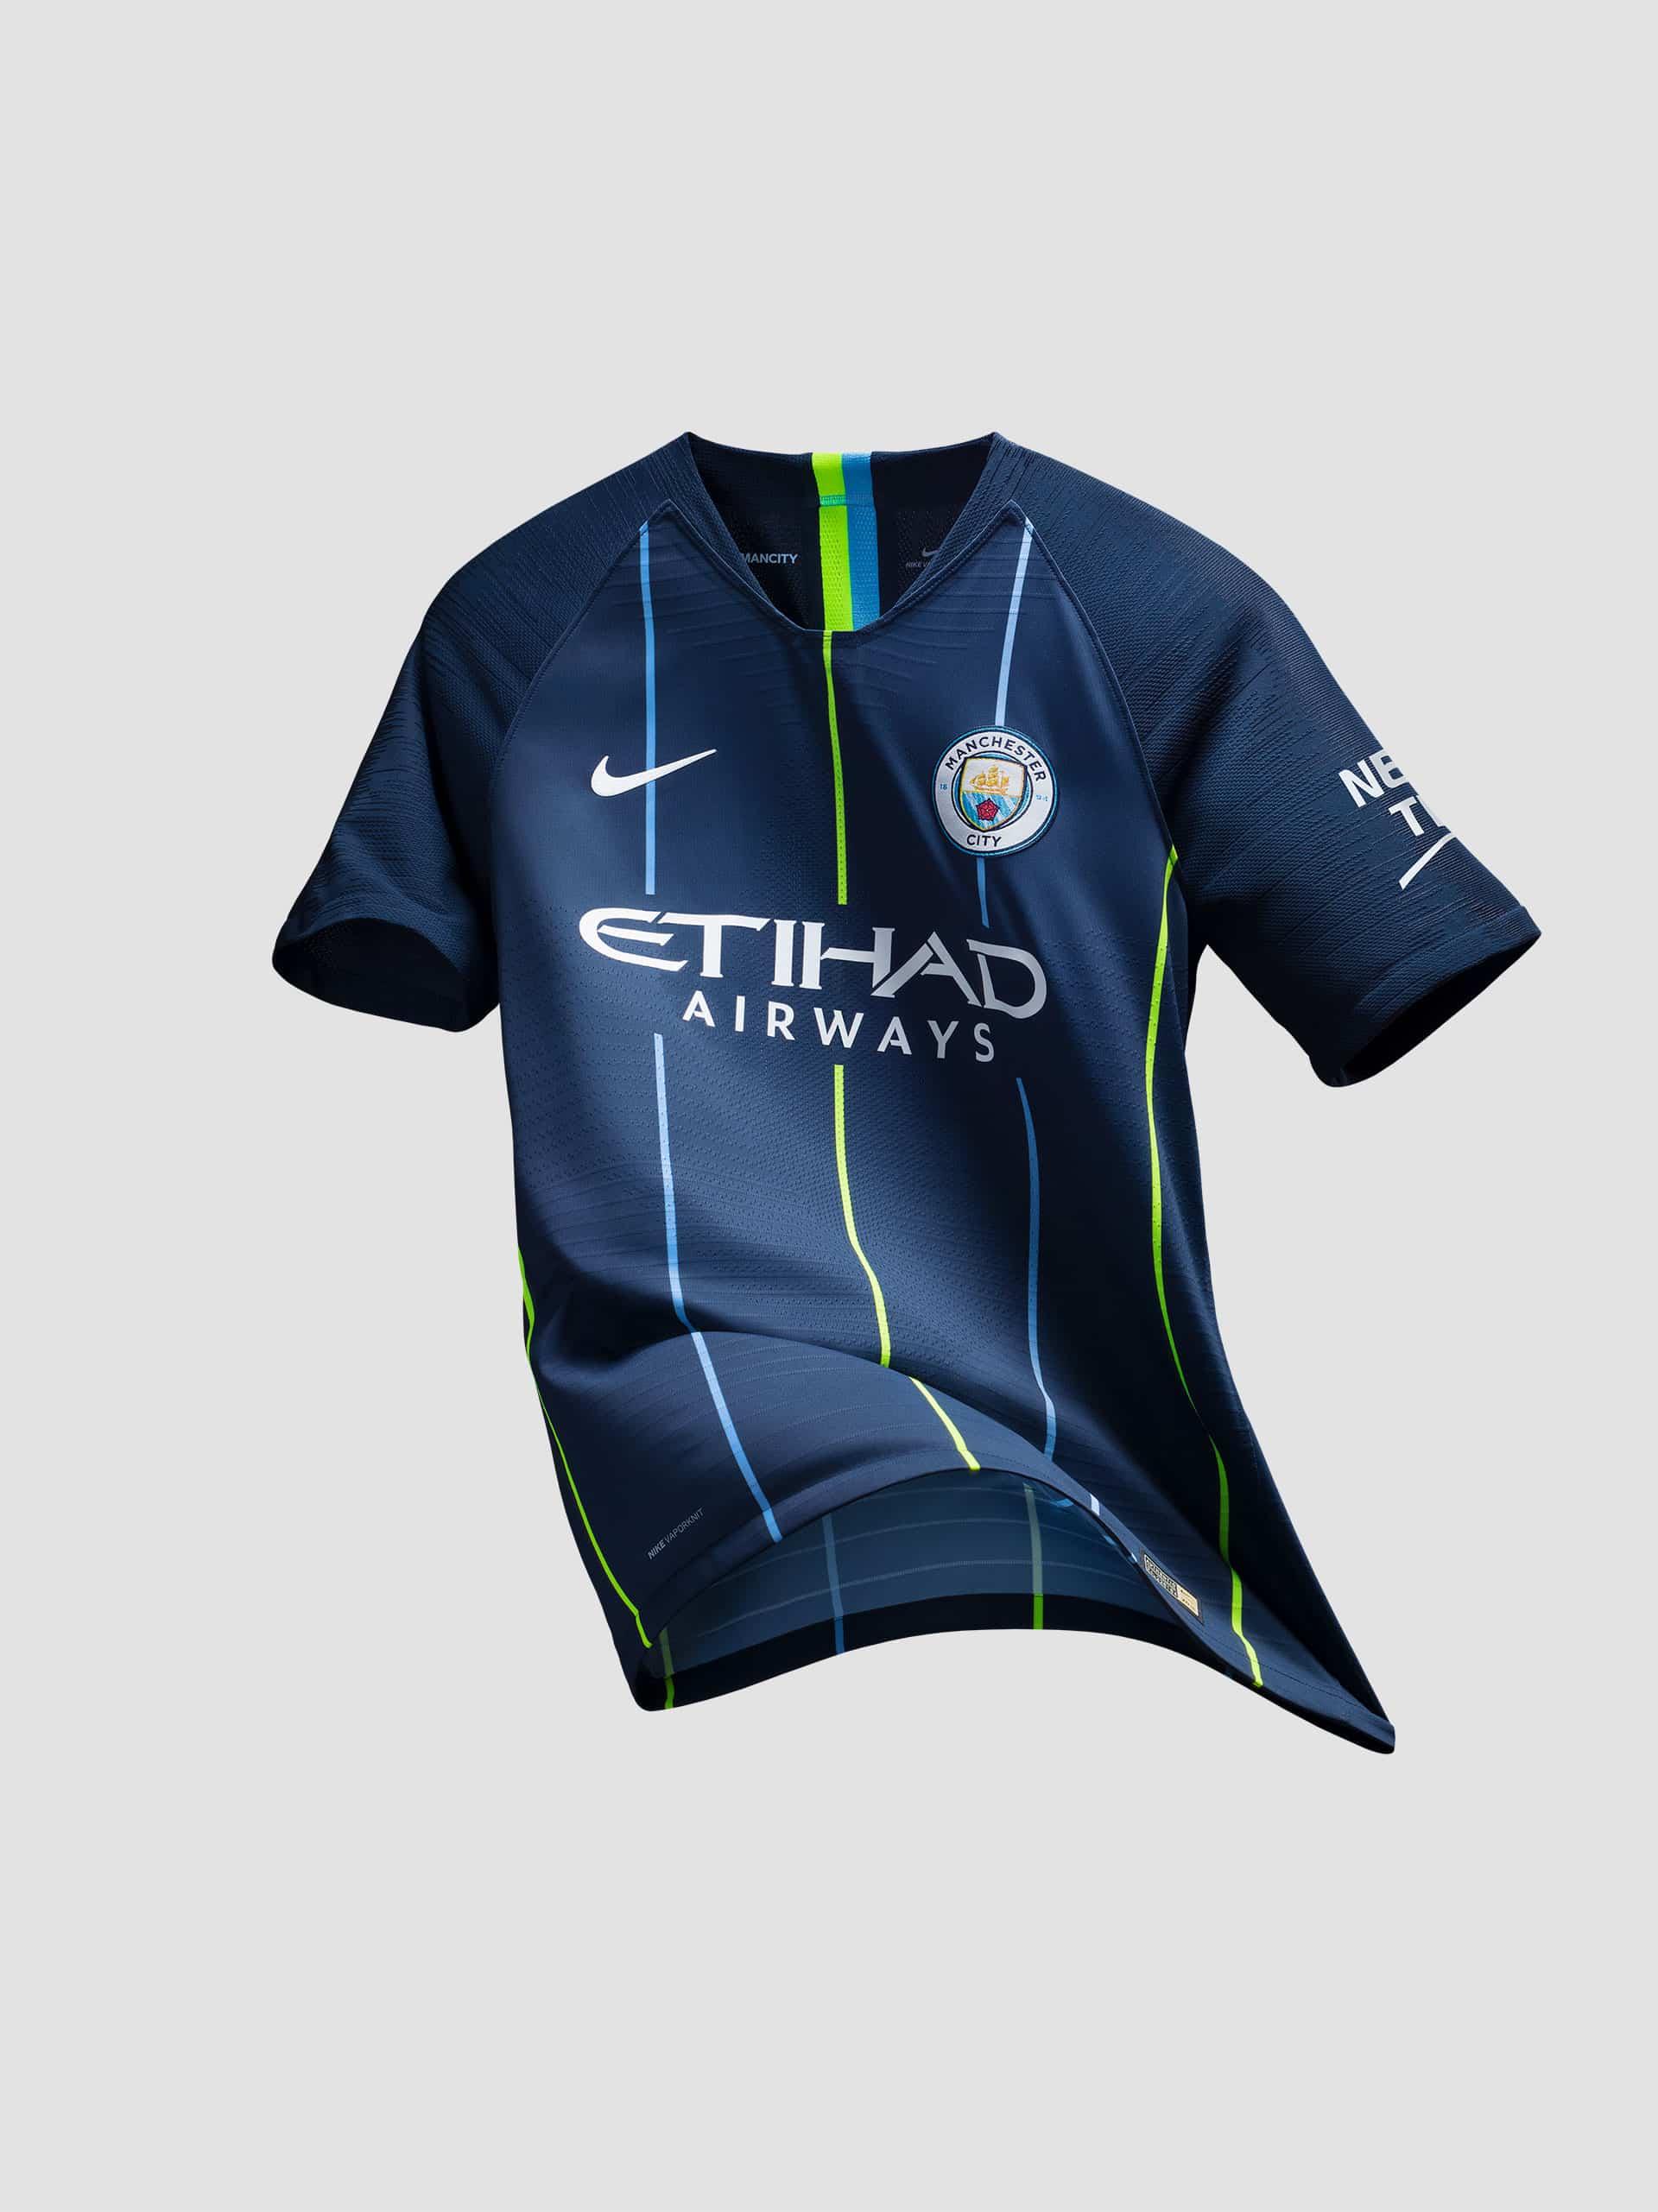 maillot-exterieur-manchester-city-2018-2019-nike